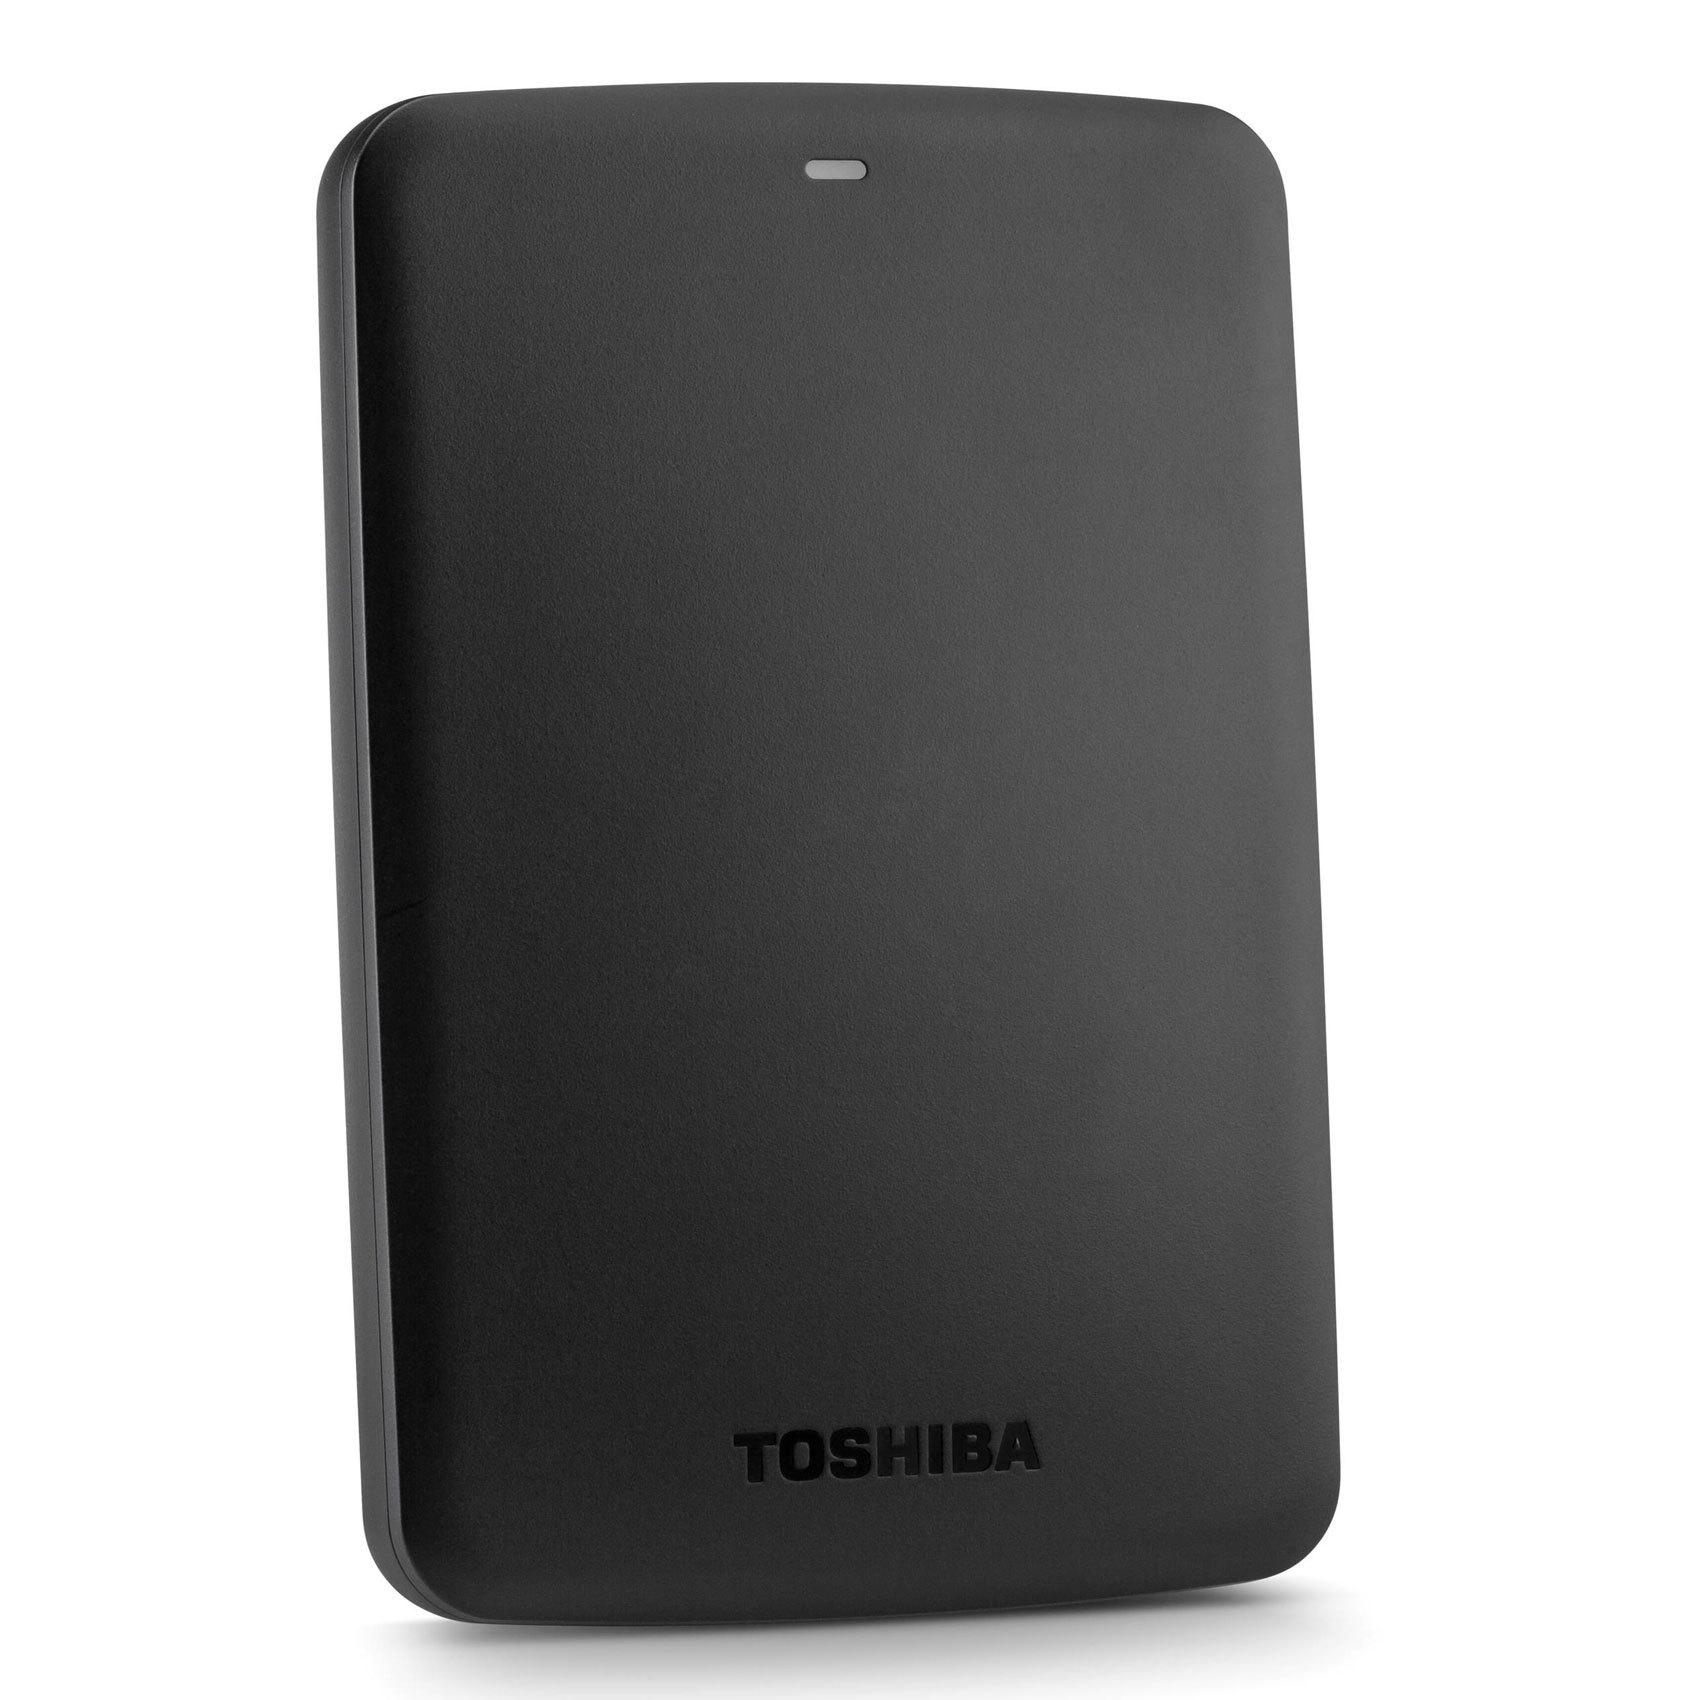 TOSHIBA HDD 3TB CANVIO BASICS